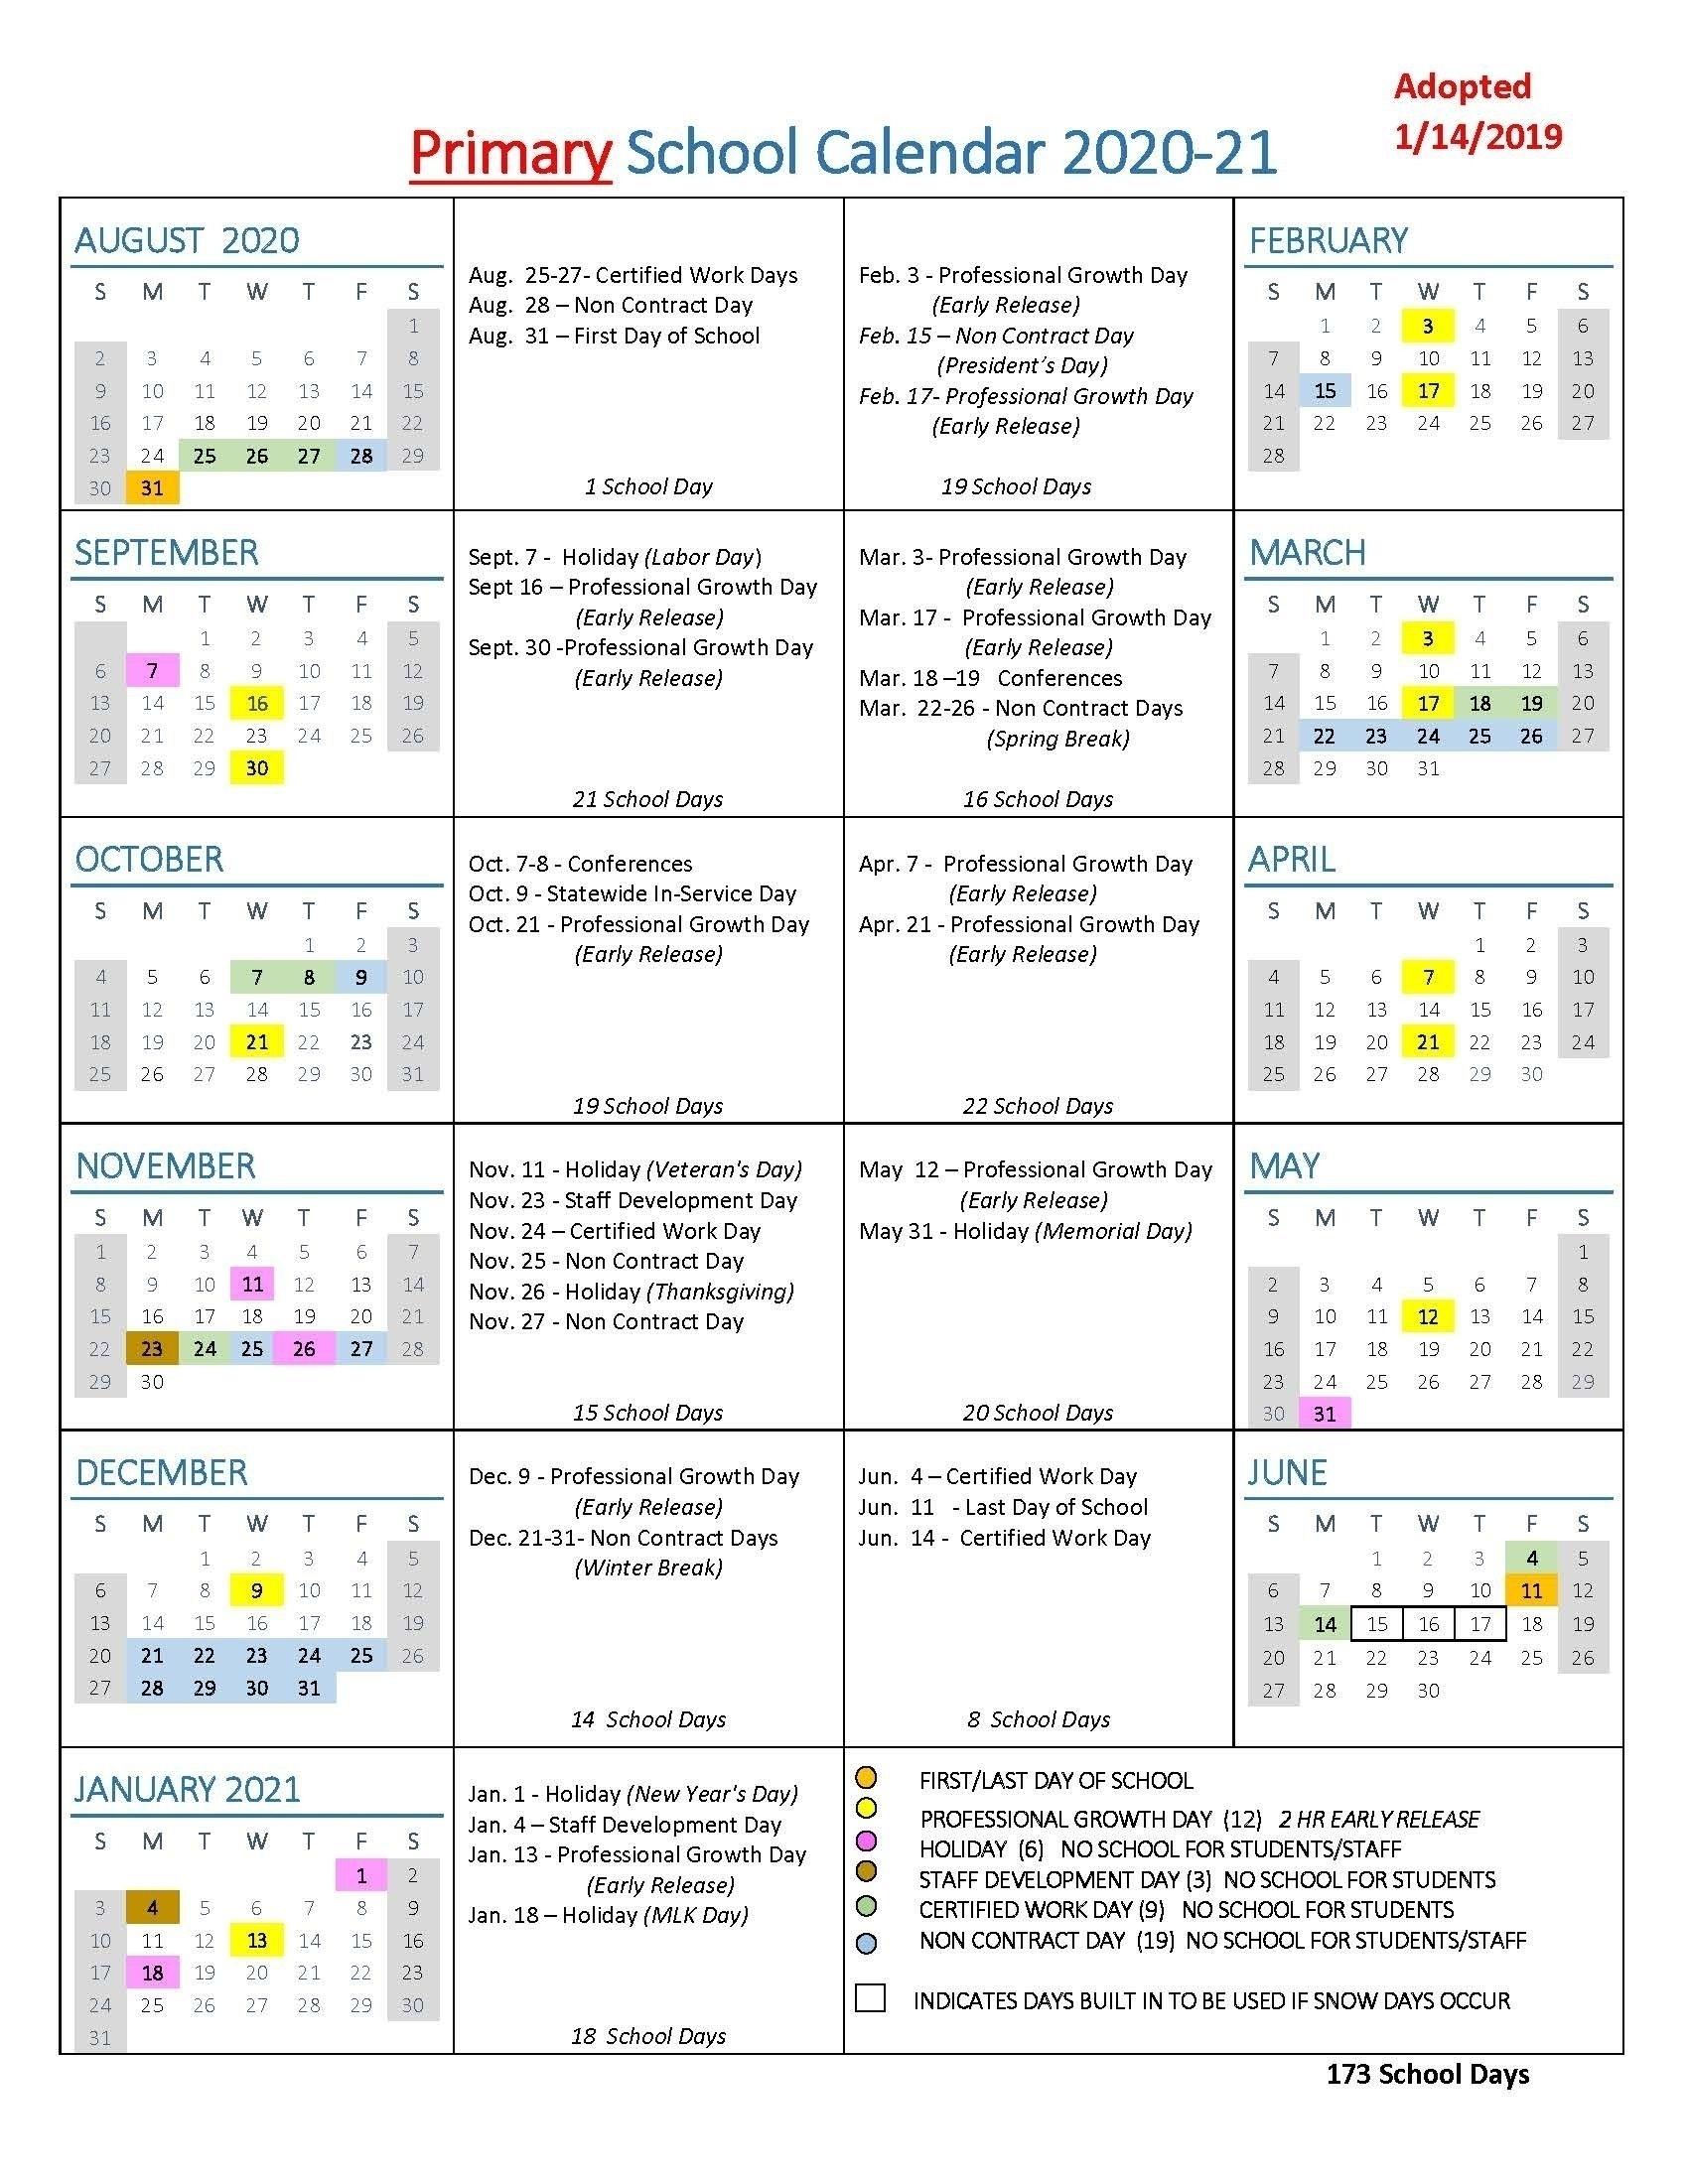 Pin On Calendar Printable Ideas within 2020 Calendar Of Special Days